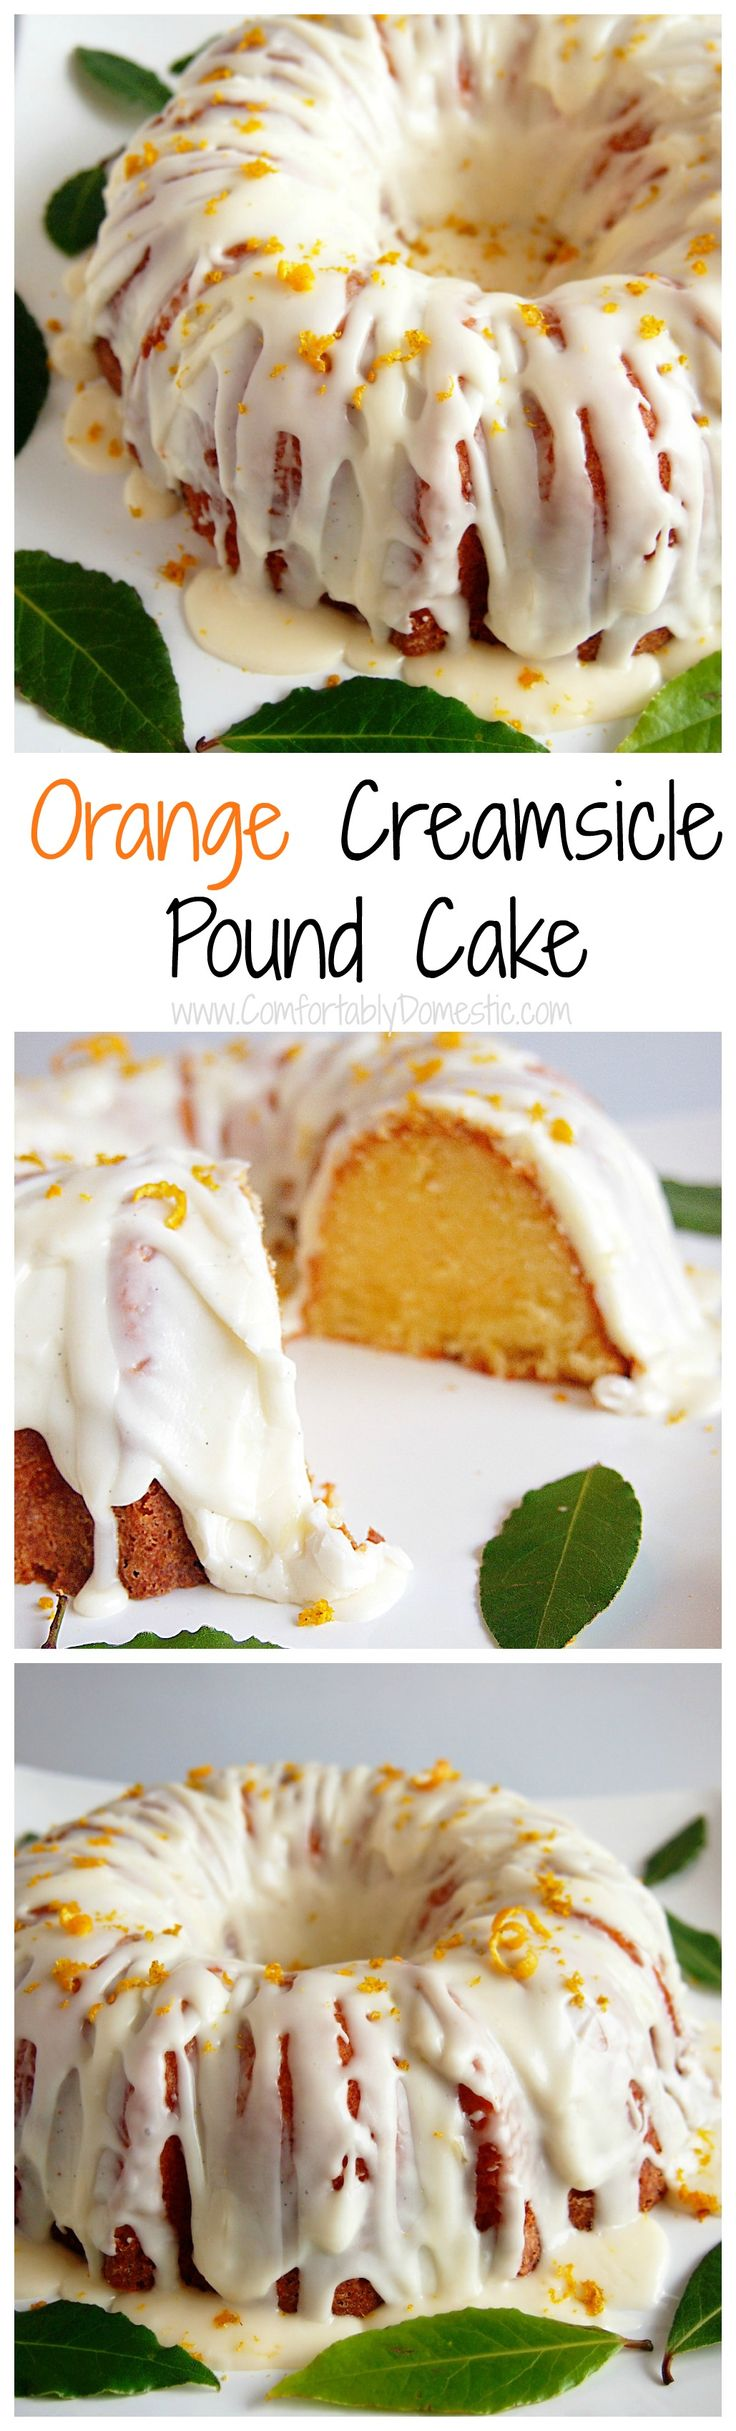 Orange Creamsicle Pound Cake marries zesty orange pound cake with creamy vanilla icing for a taste as refreshing as the nostalgic frozen treat. via @comfortdomestic